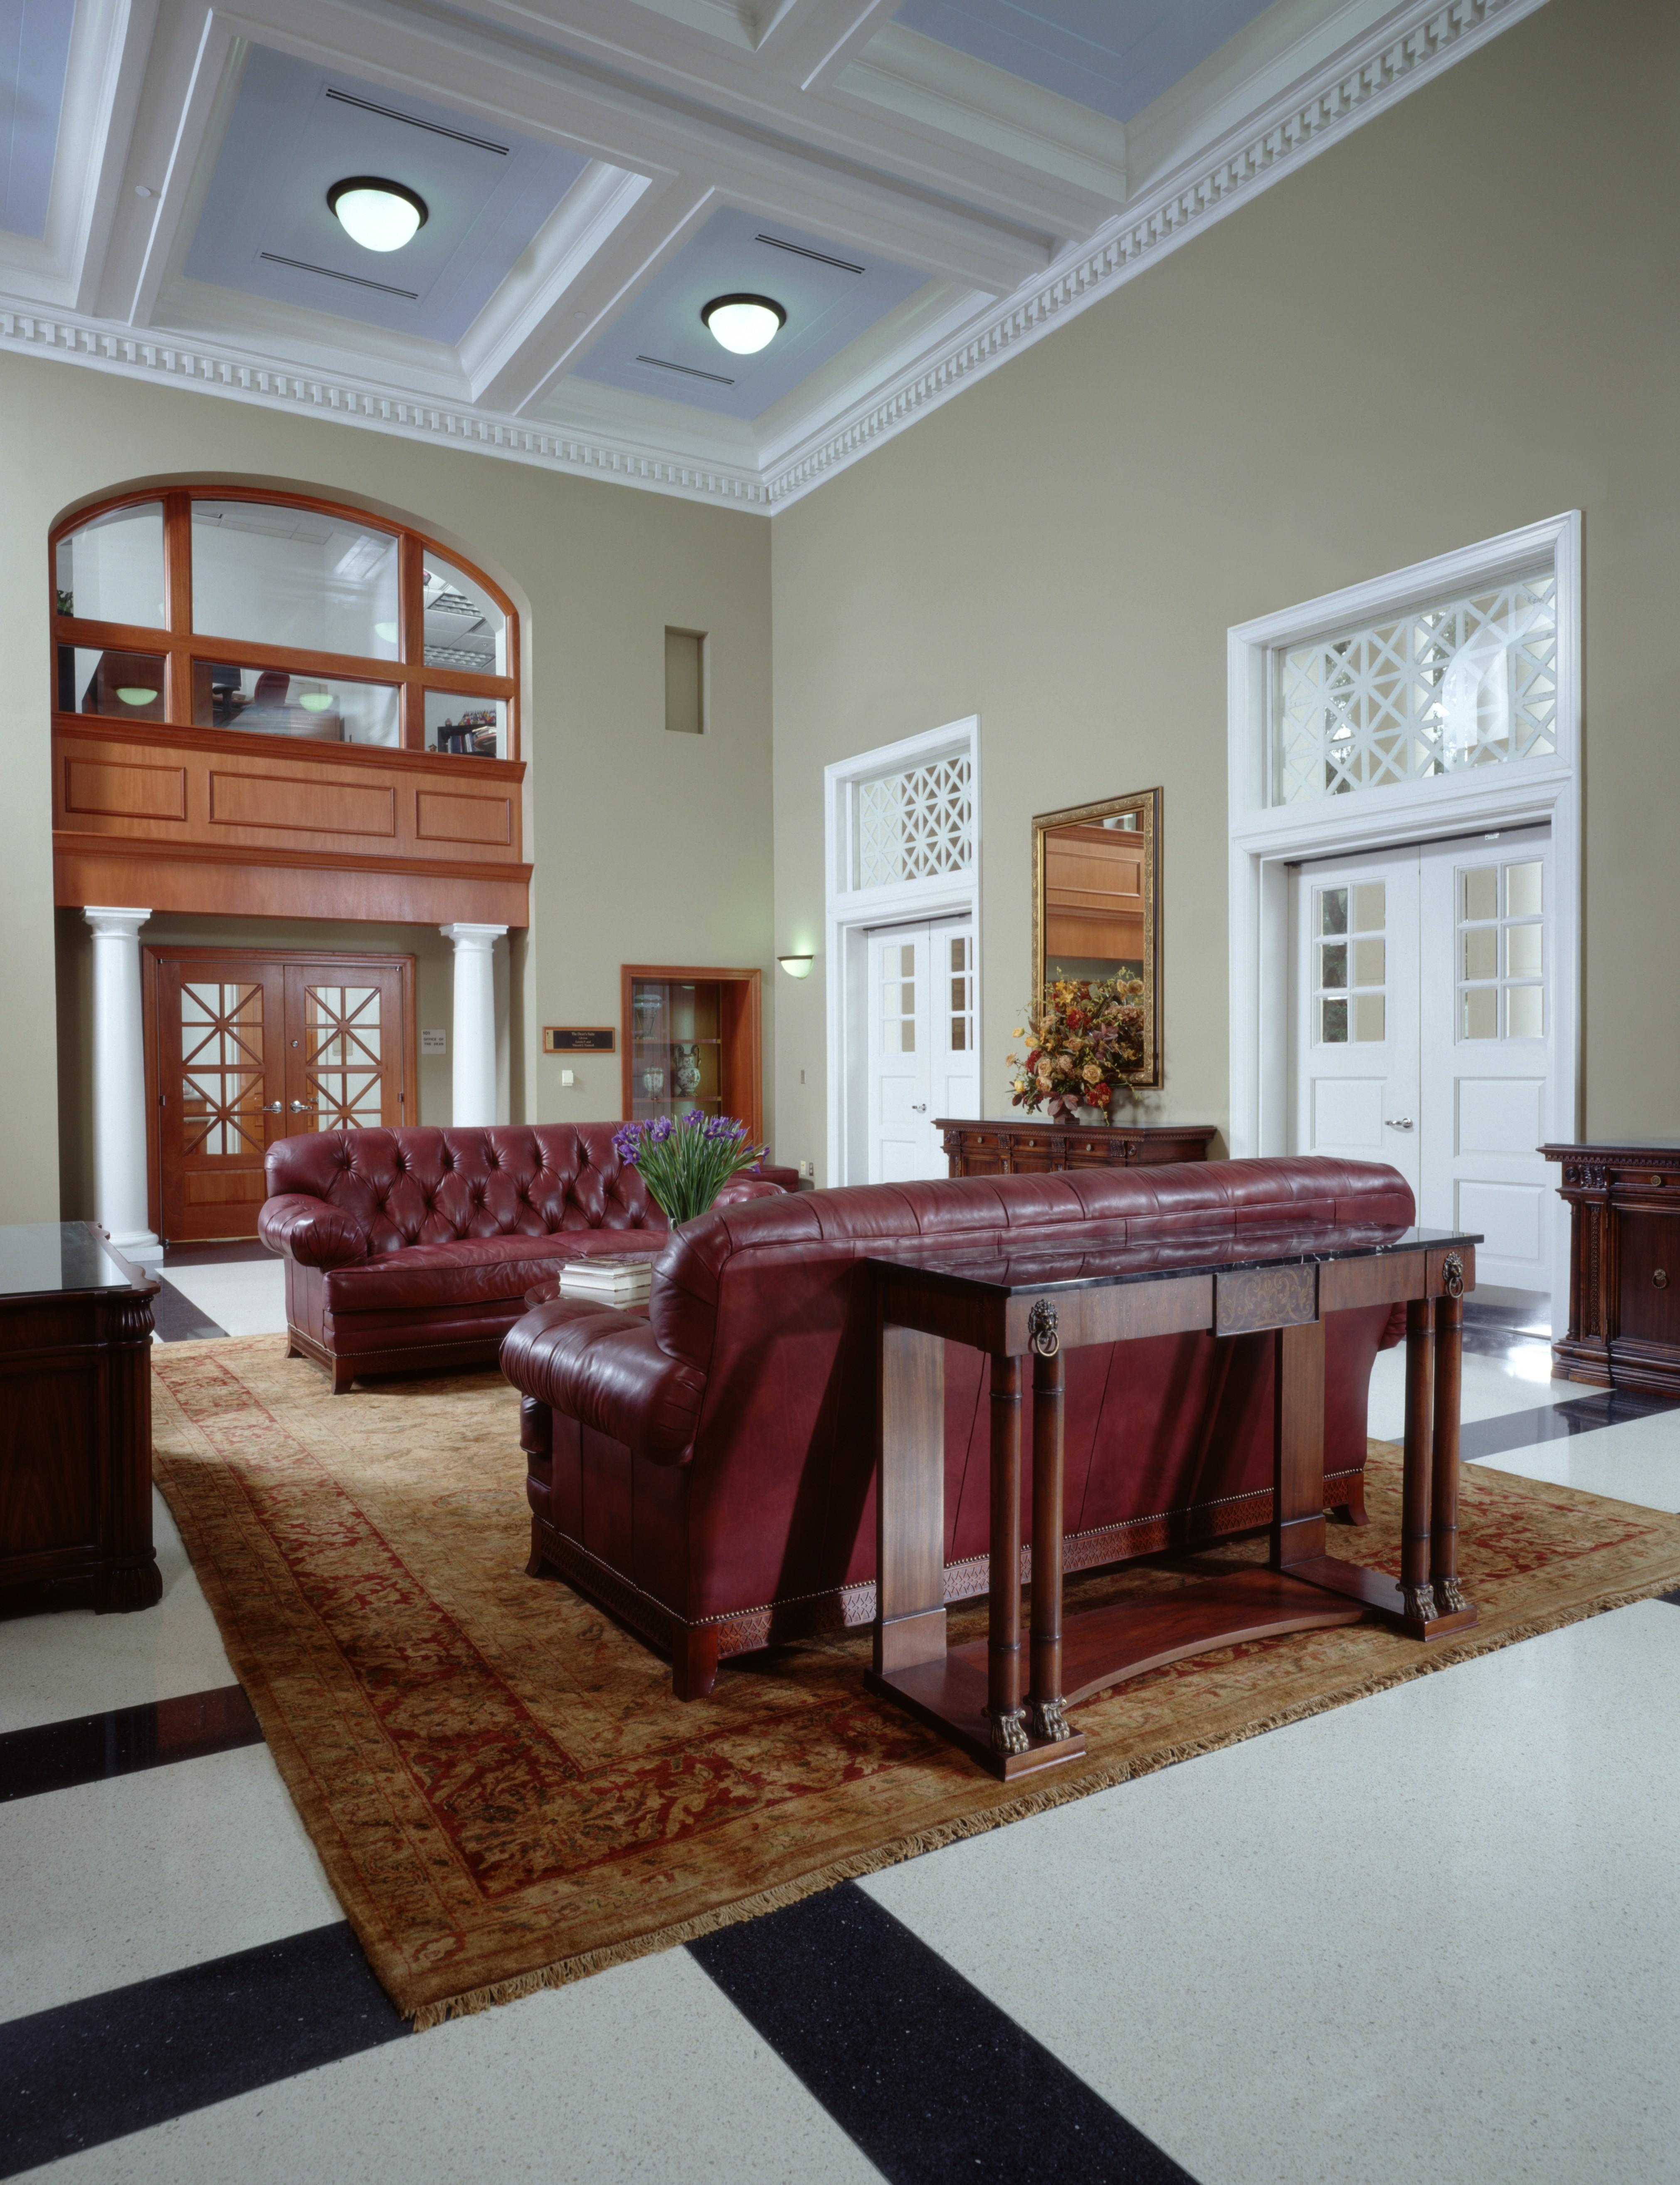 Sykes school of business interior design schools tampa for Interior designs tampa